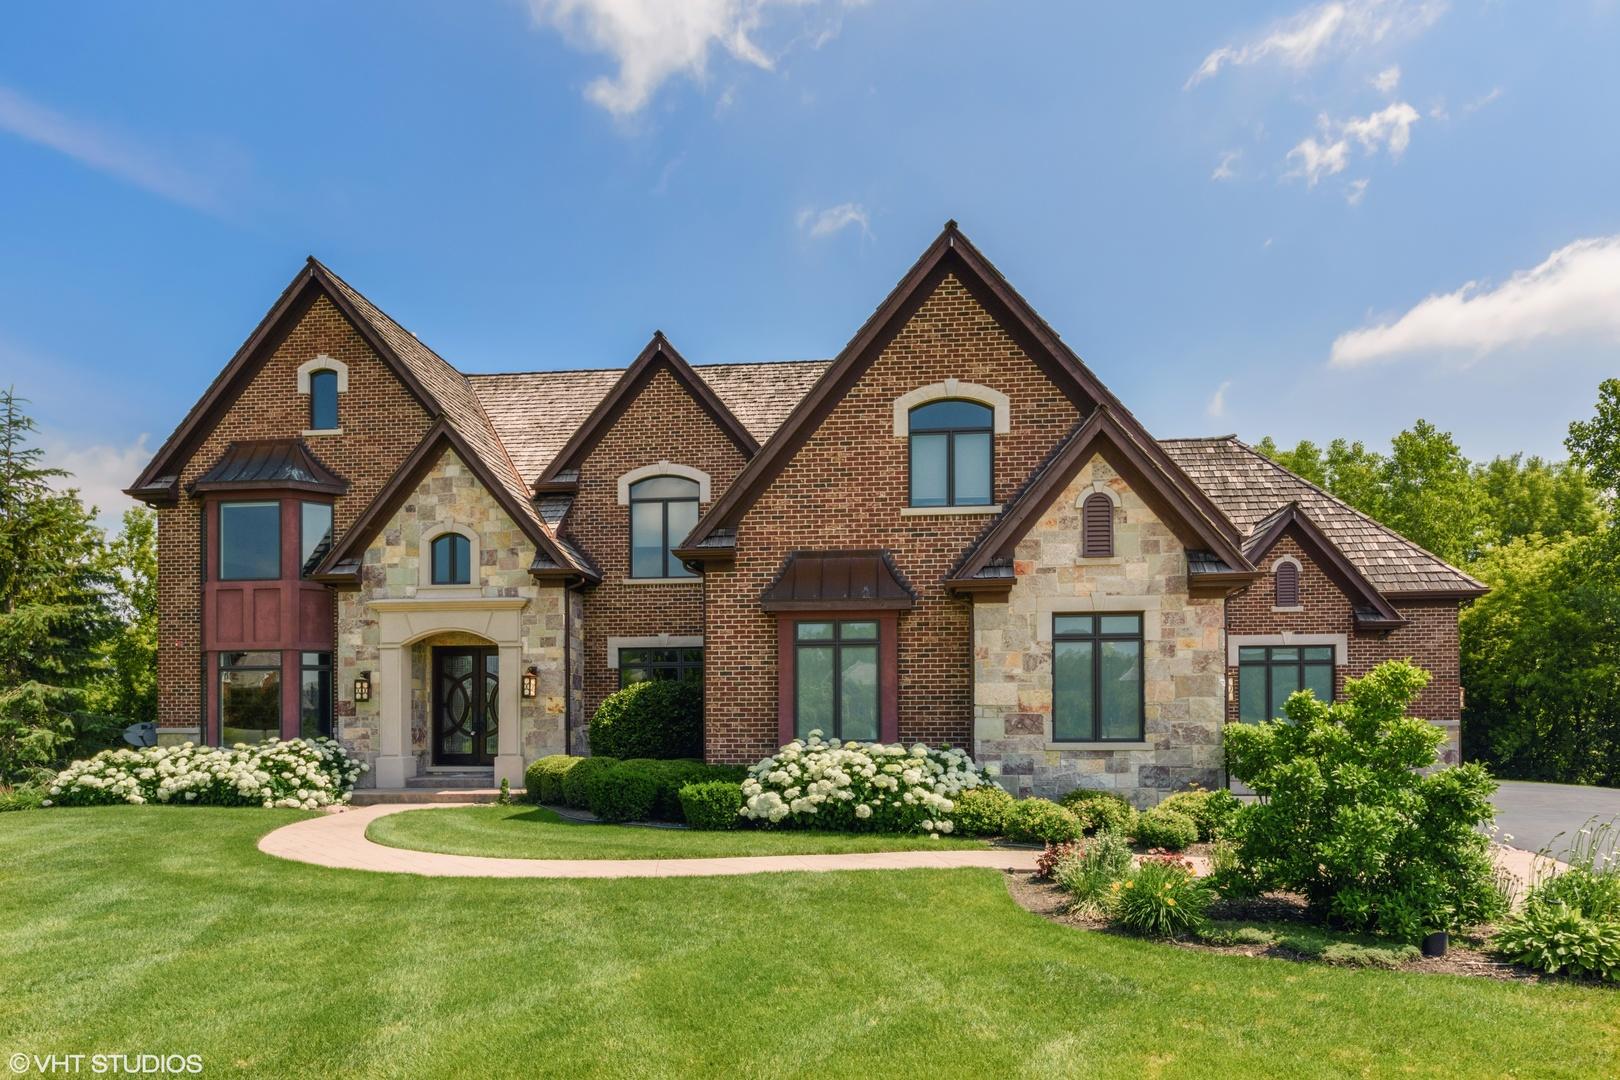 23715 North Matthew Court, Long Grove, Illinois 60047